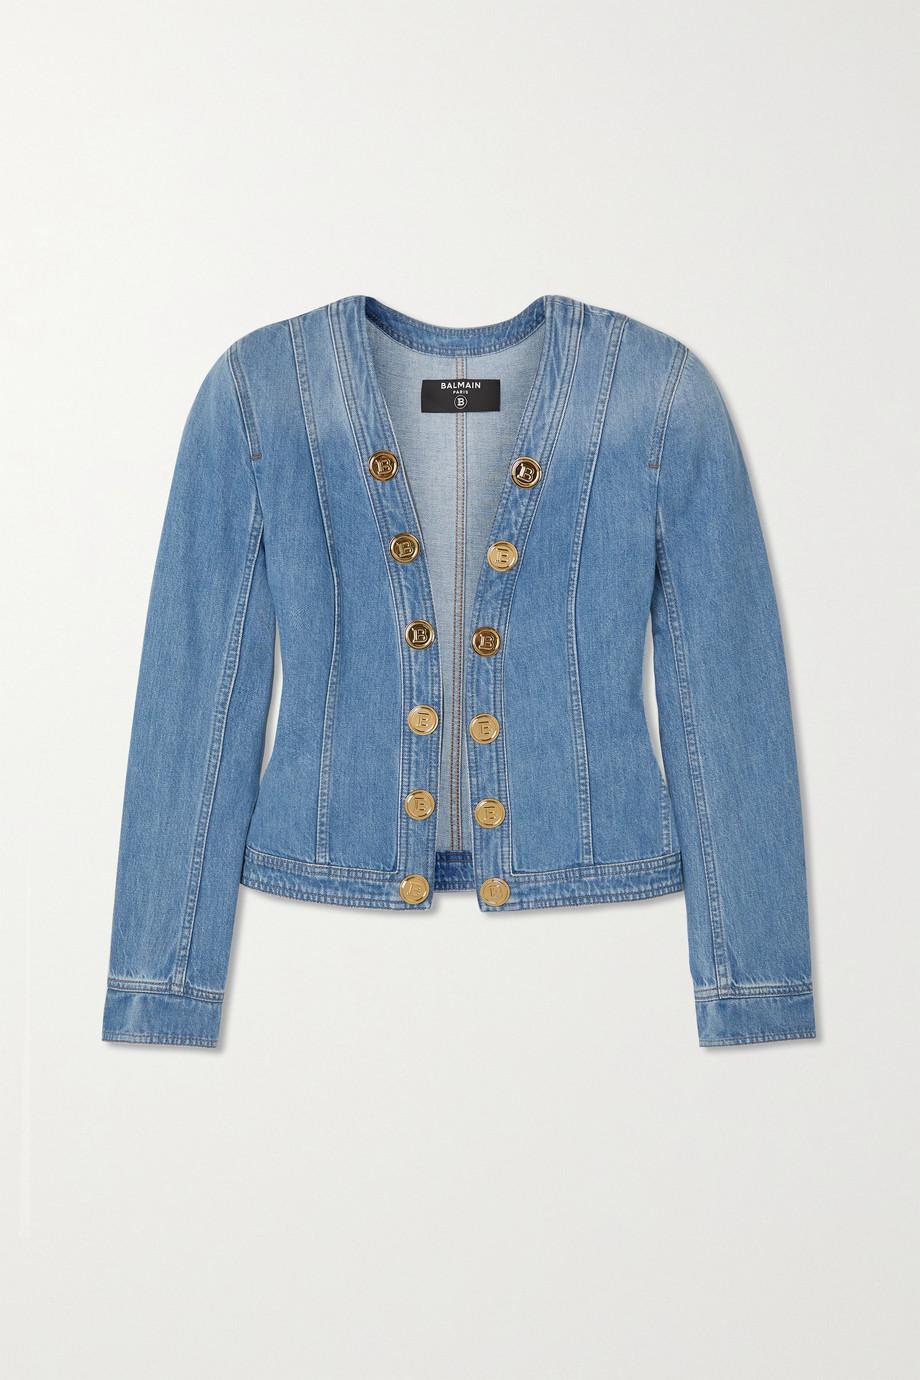 Balmain Button-embellished denim jacket